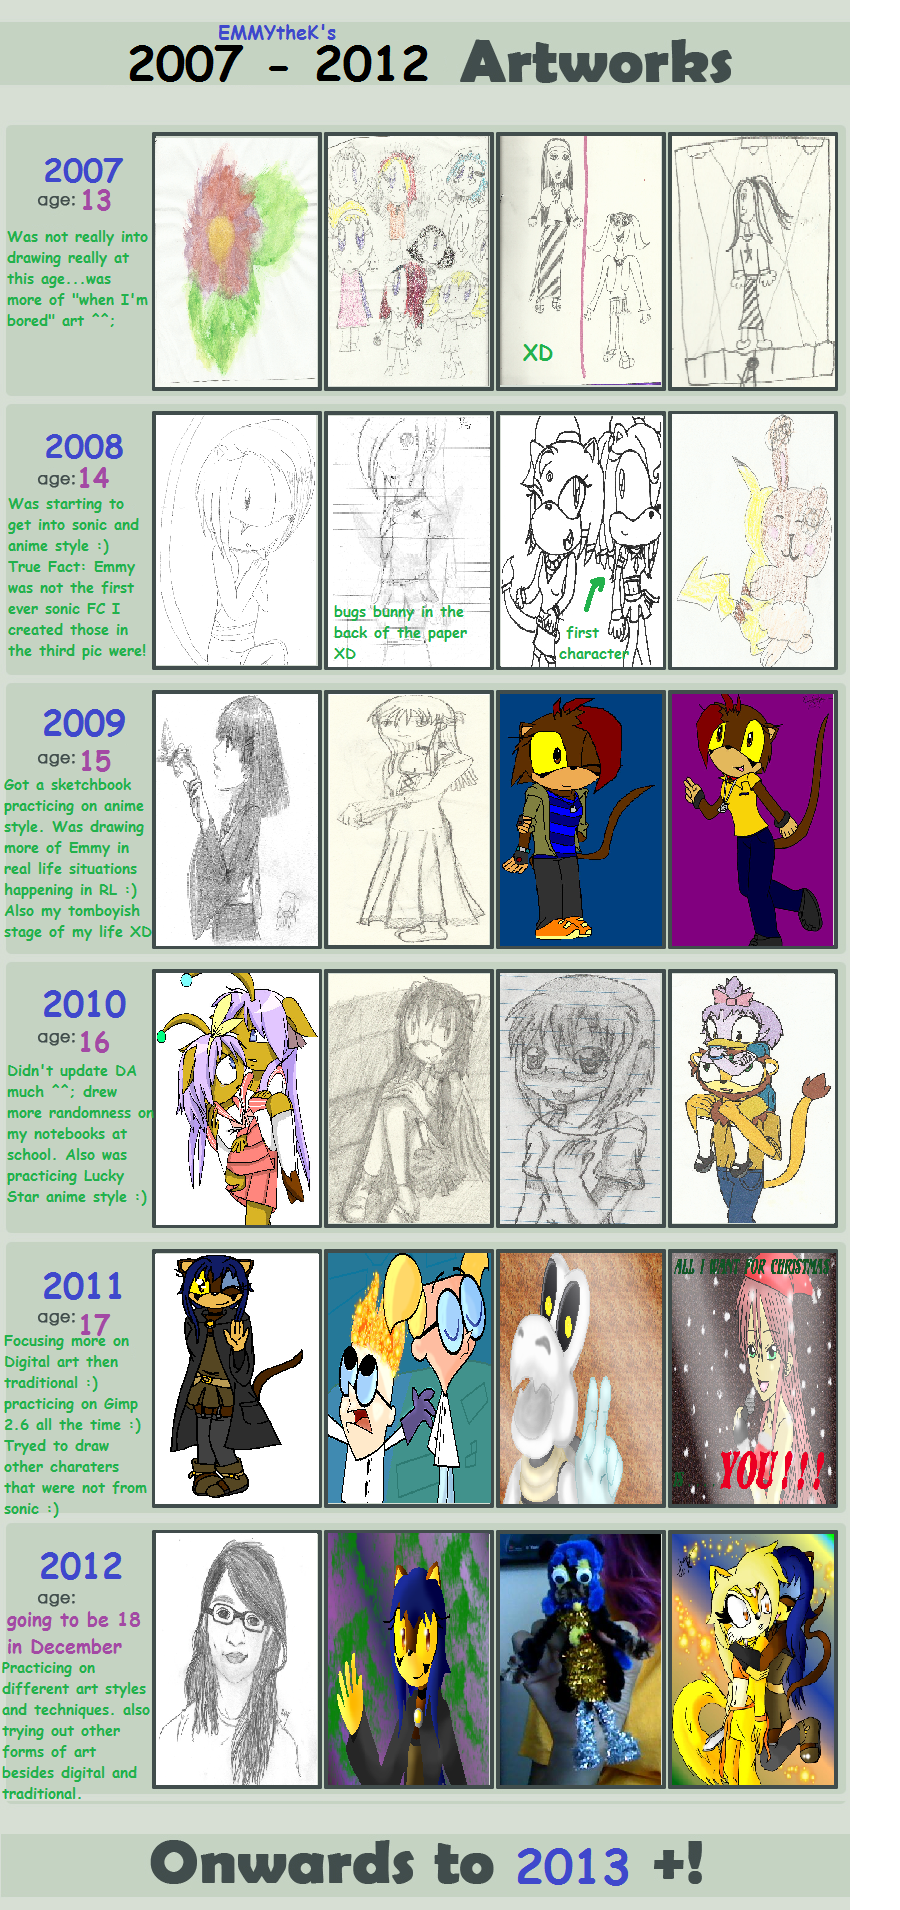 Improvement meme 2007 to 2012 by EMMYtheK on DeviantArt